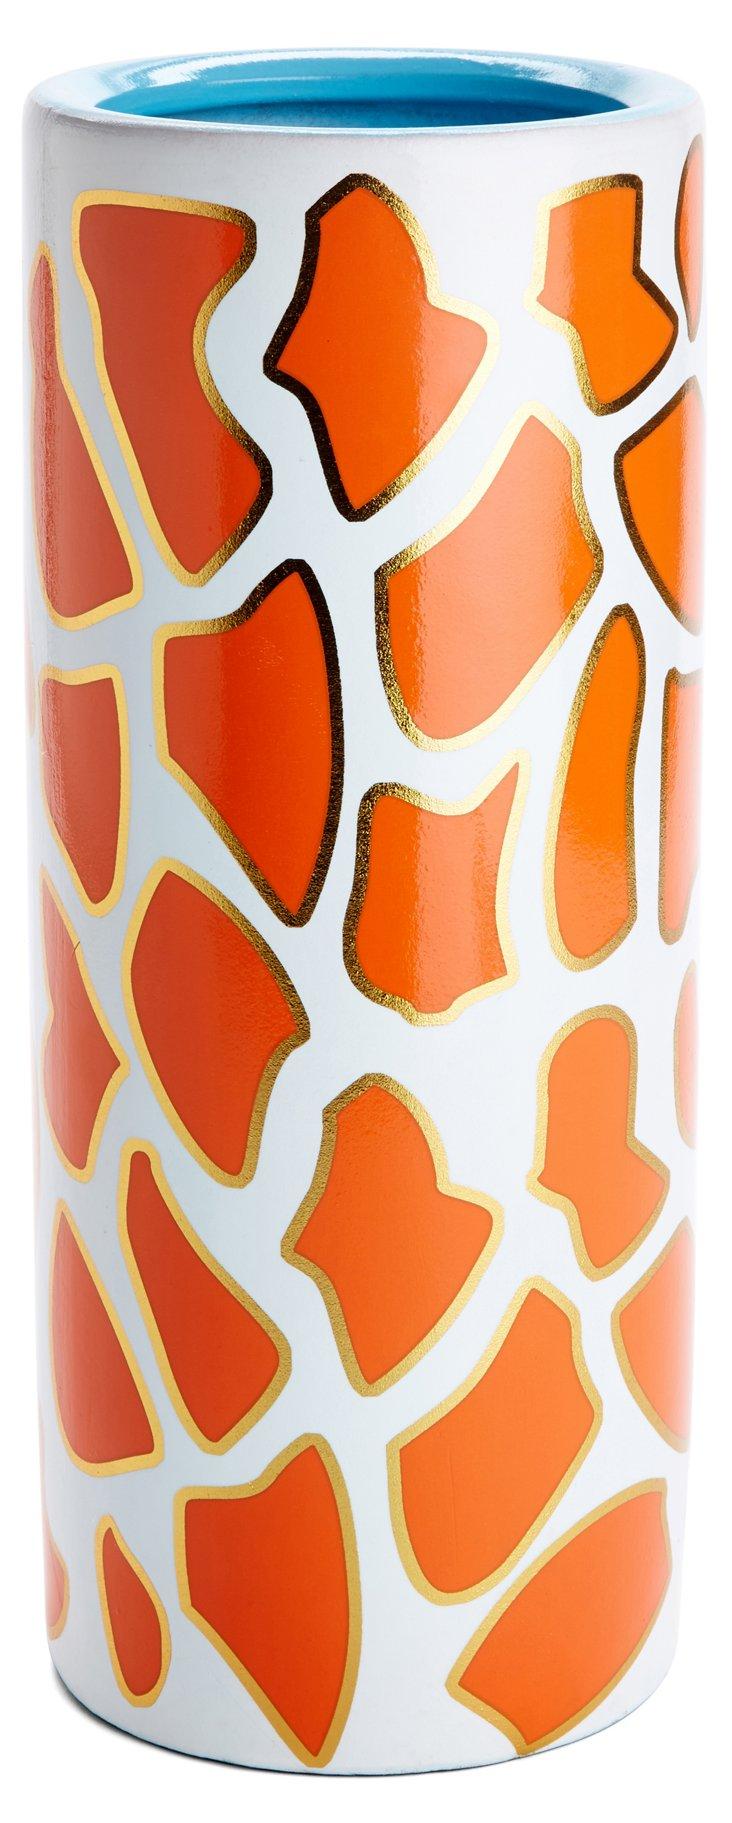 "13"" Giraffe Print Vase"